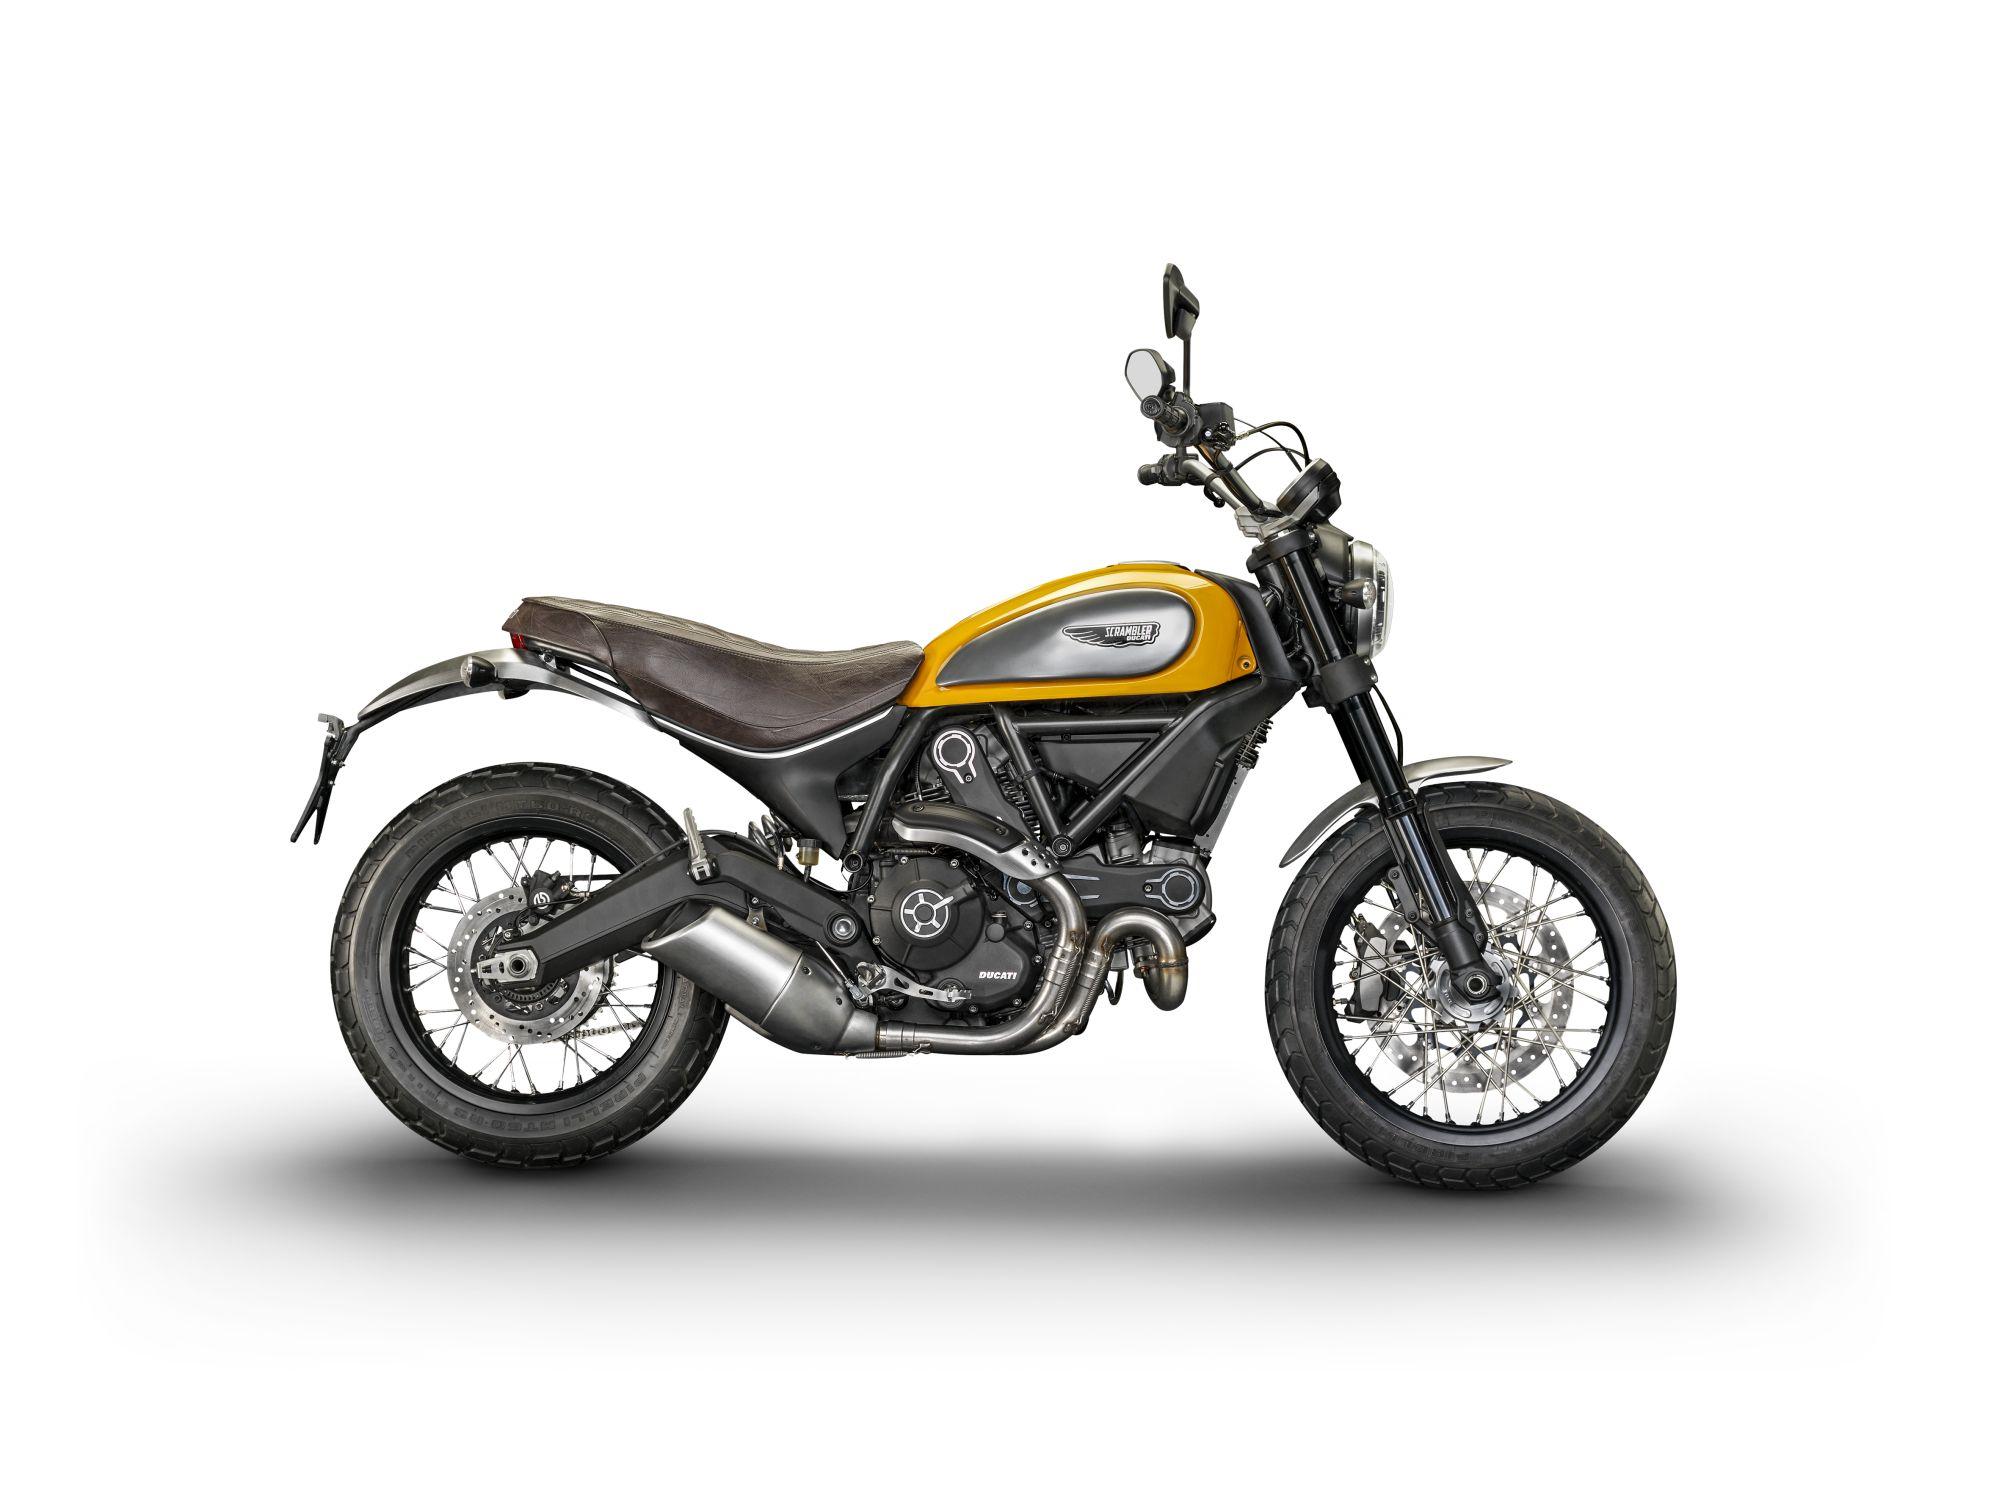 Ducati Scrambler Price In Bangalore